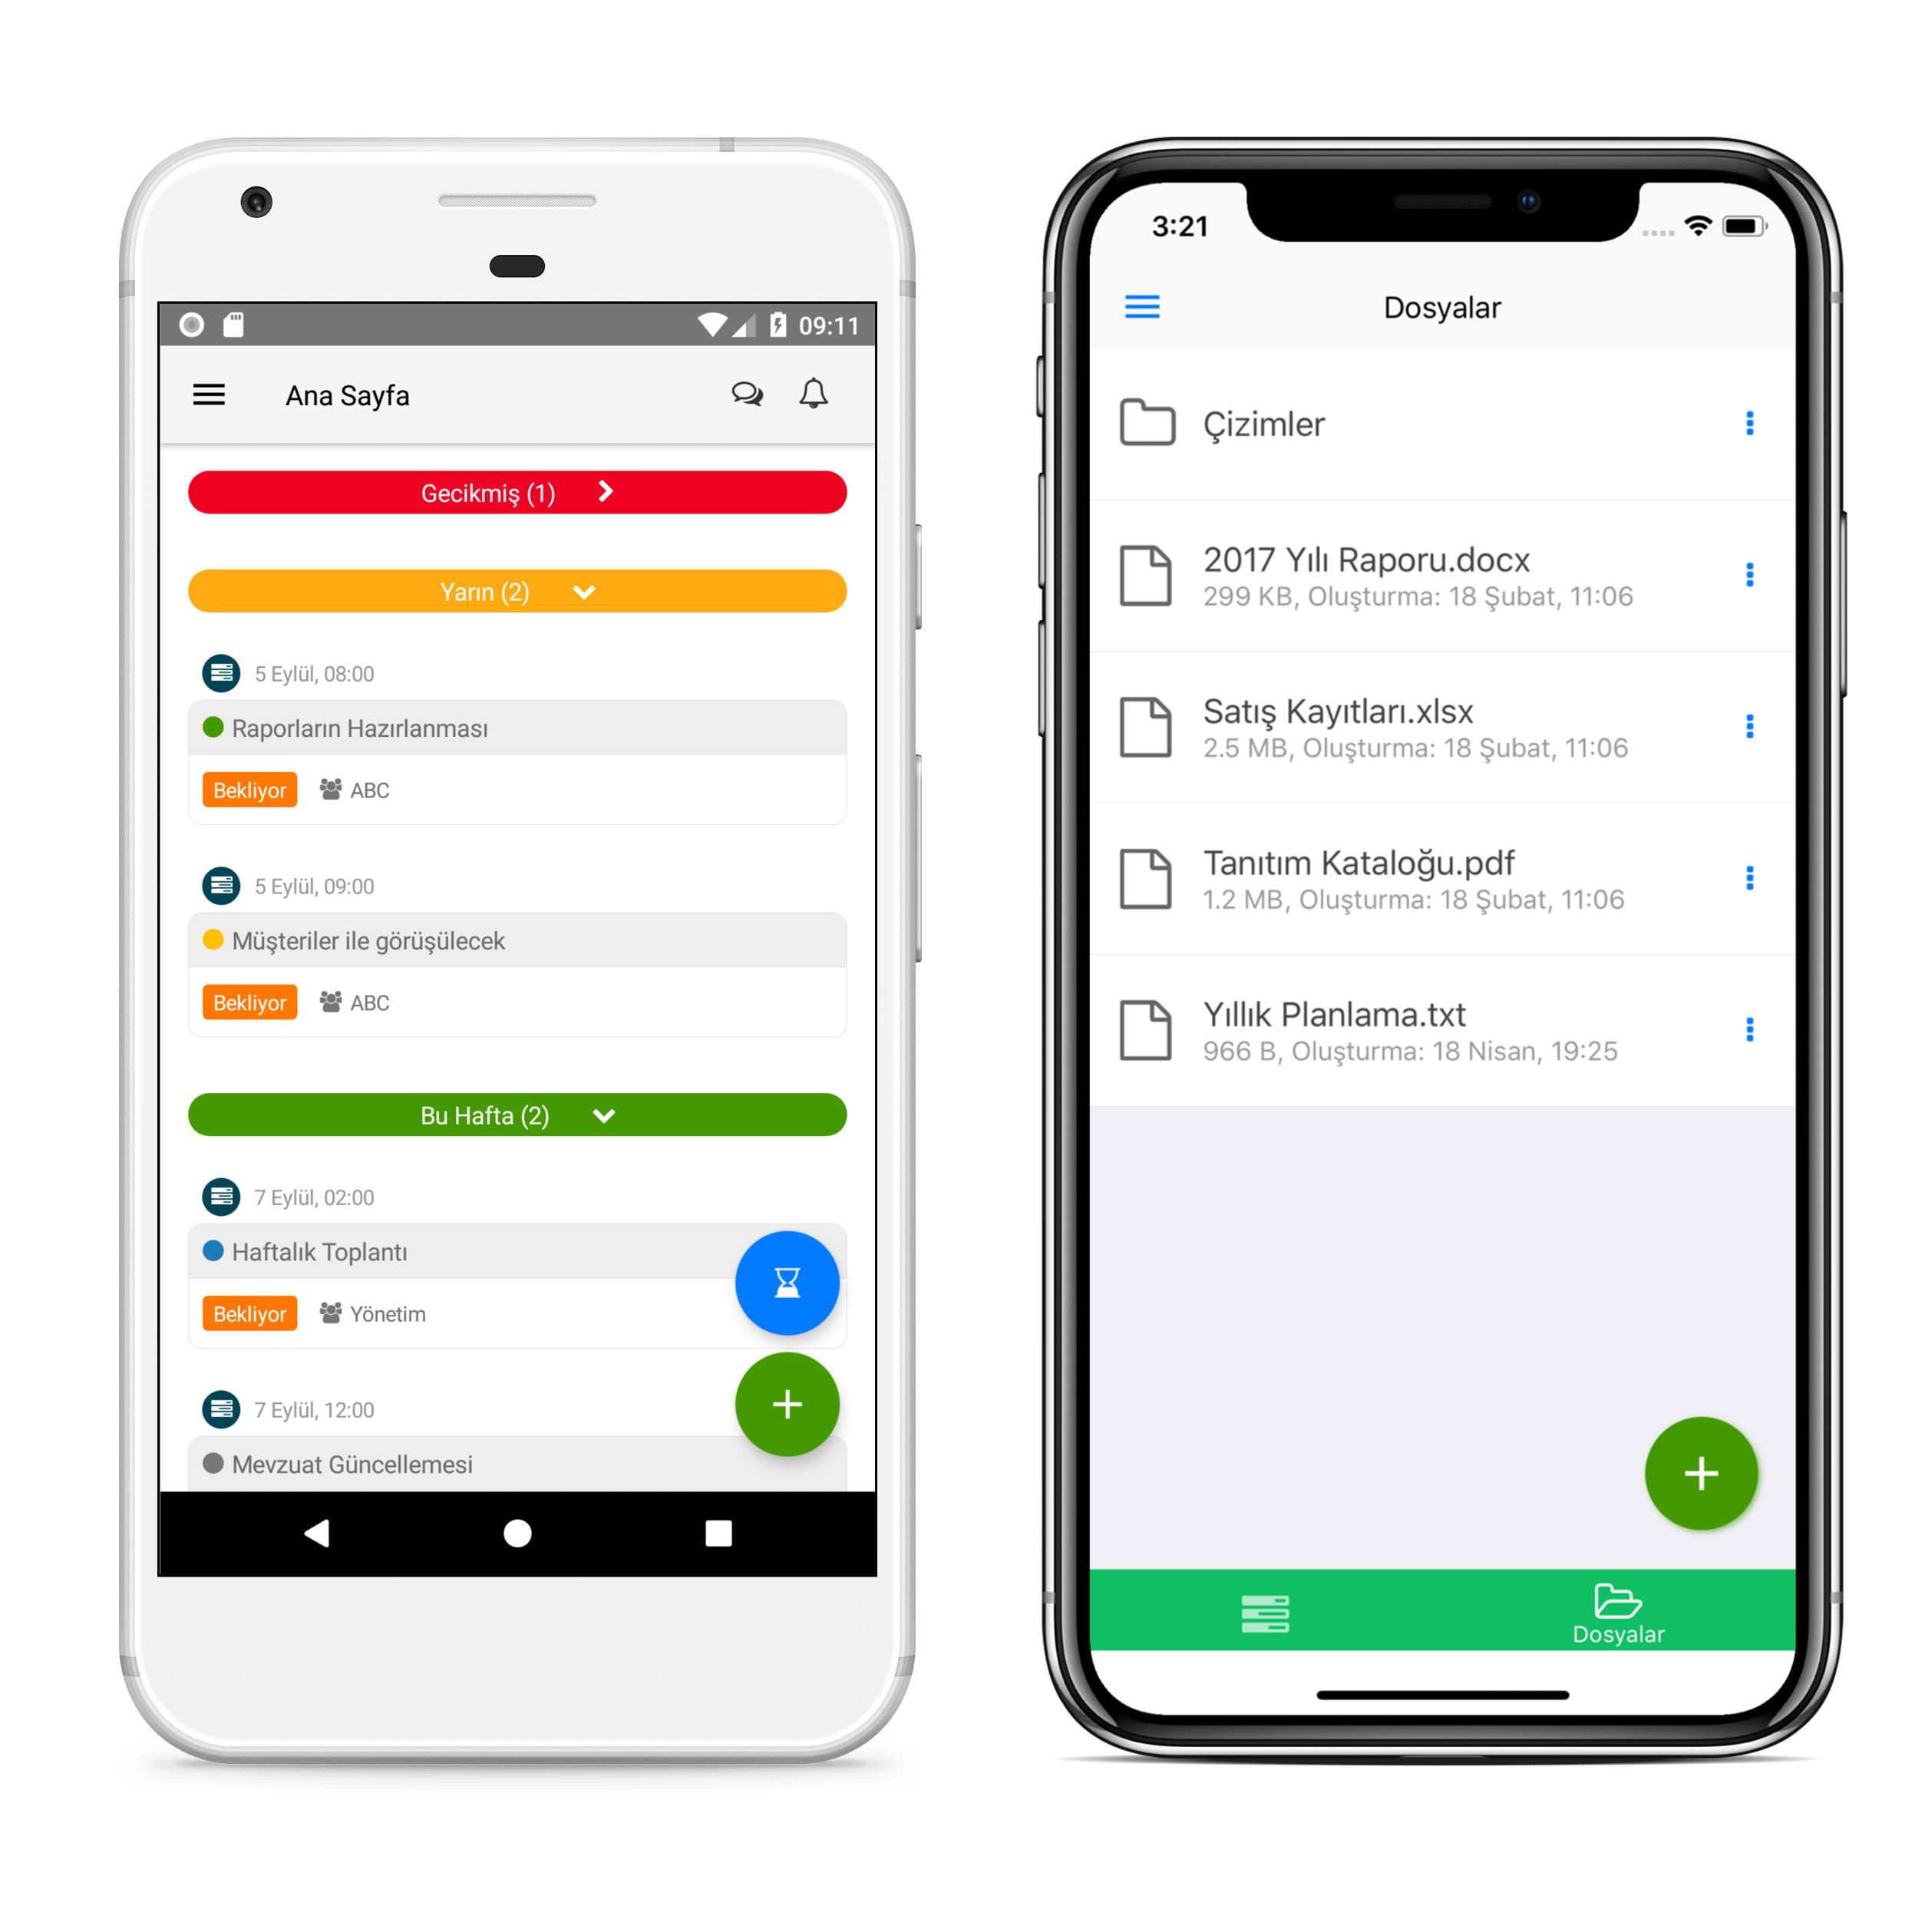 iphone 5 takip programi